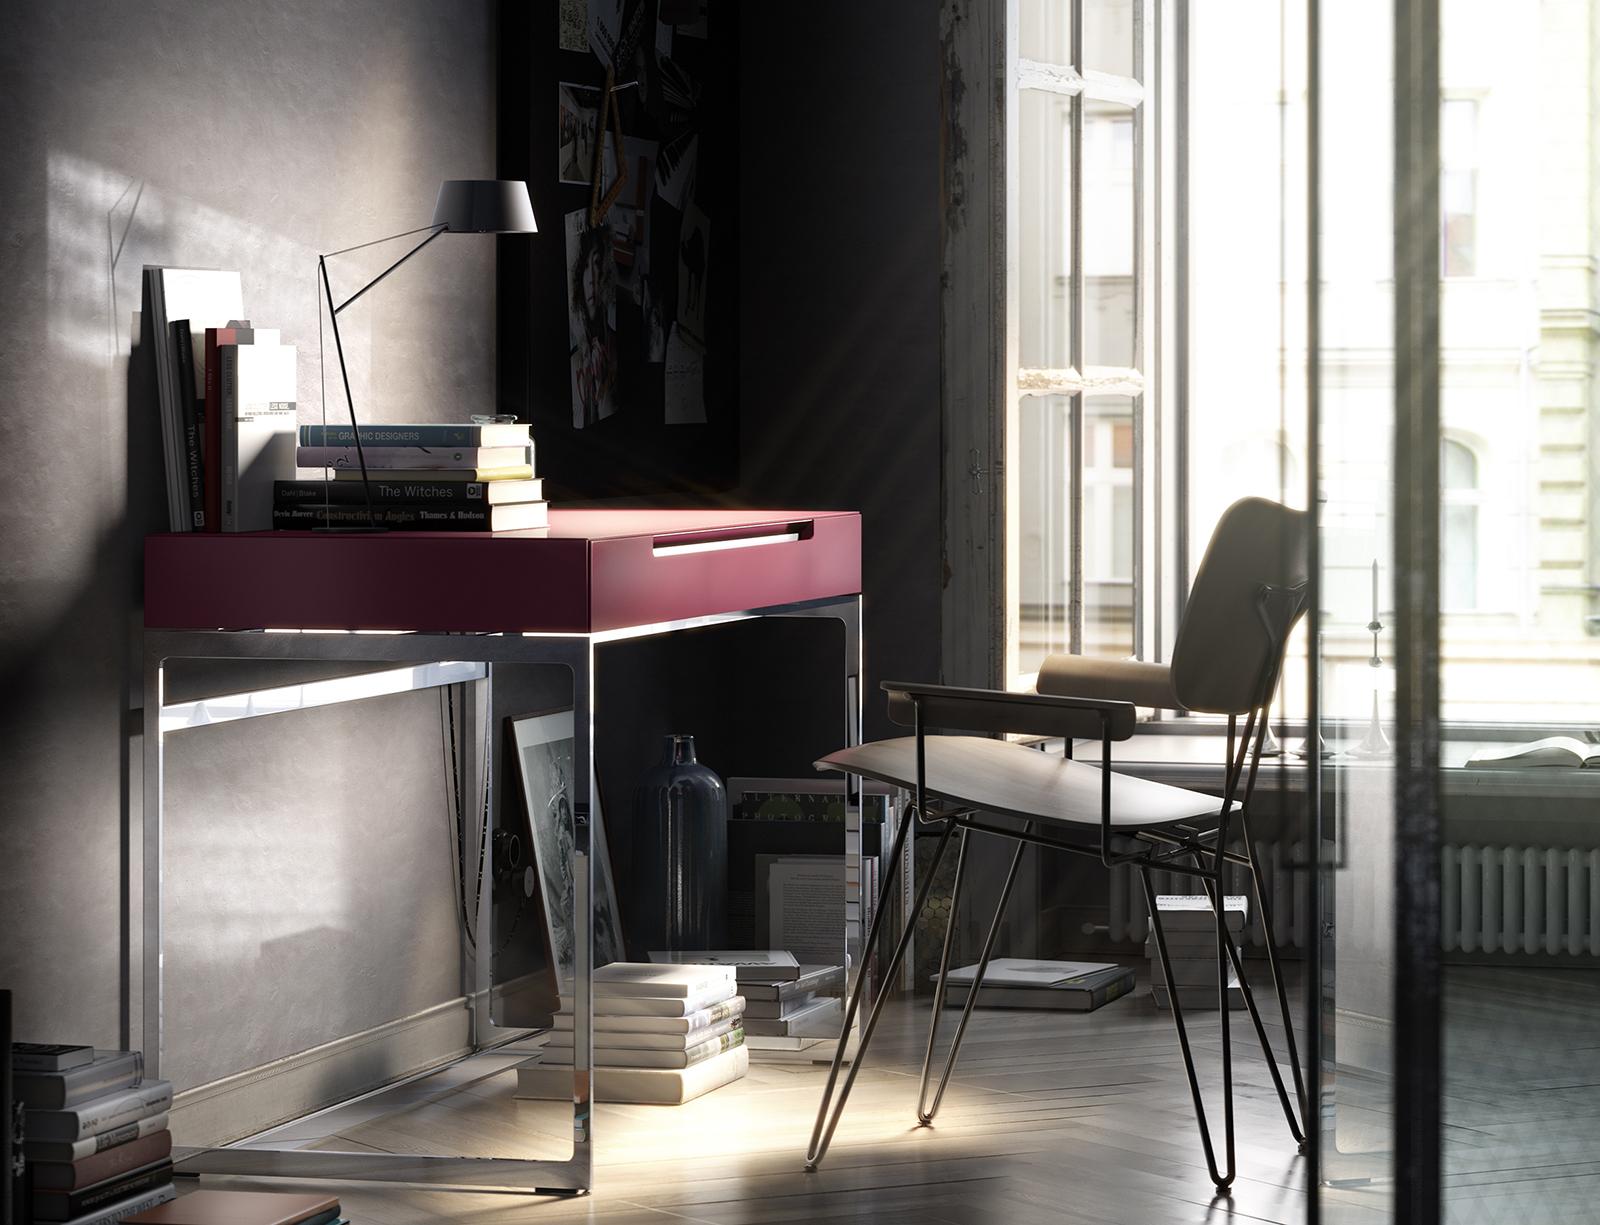 Interlübke Tisch Schreibtisch Mell Sekret Reutlingen